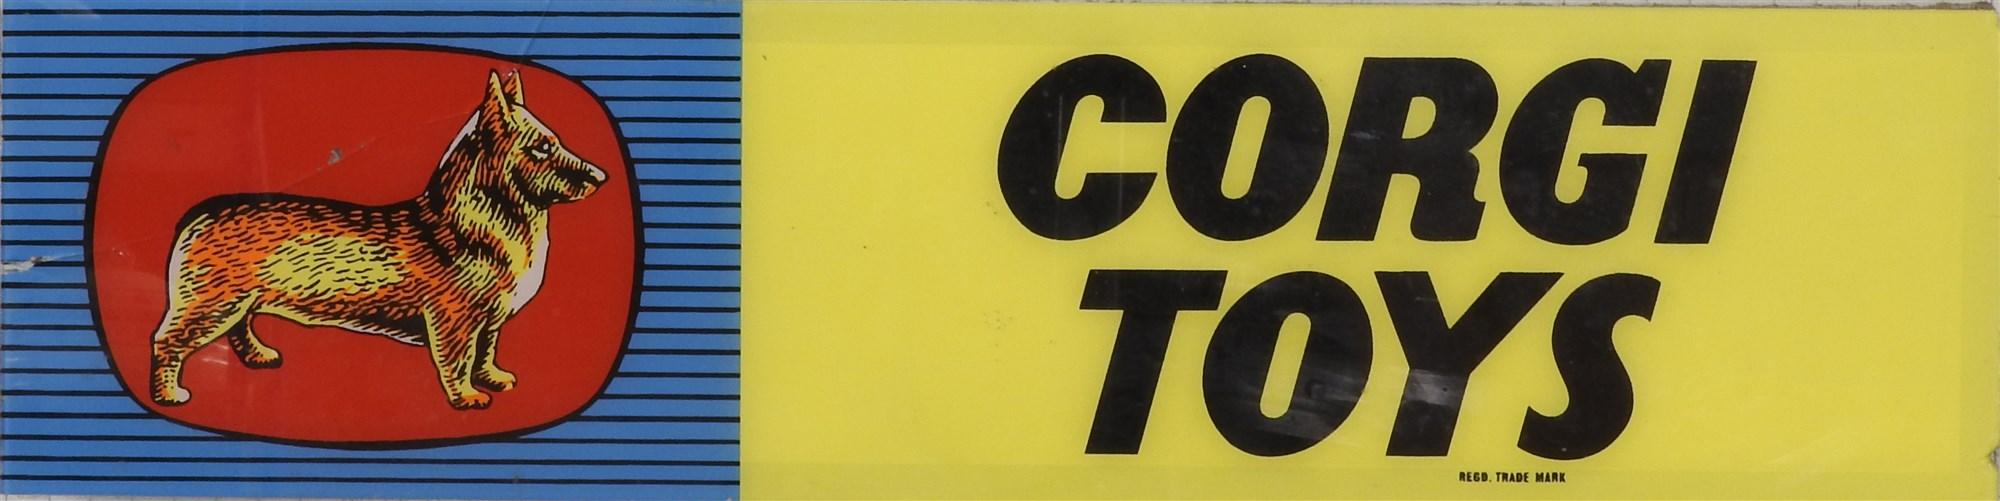 Lot 466 - A Corgi Toys Advertising Panel